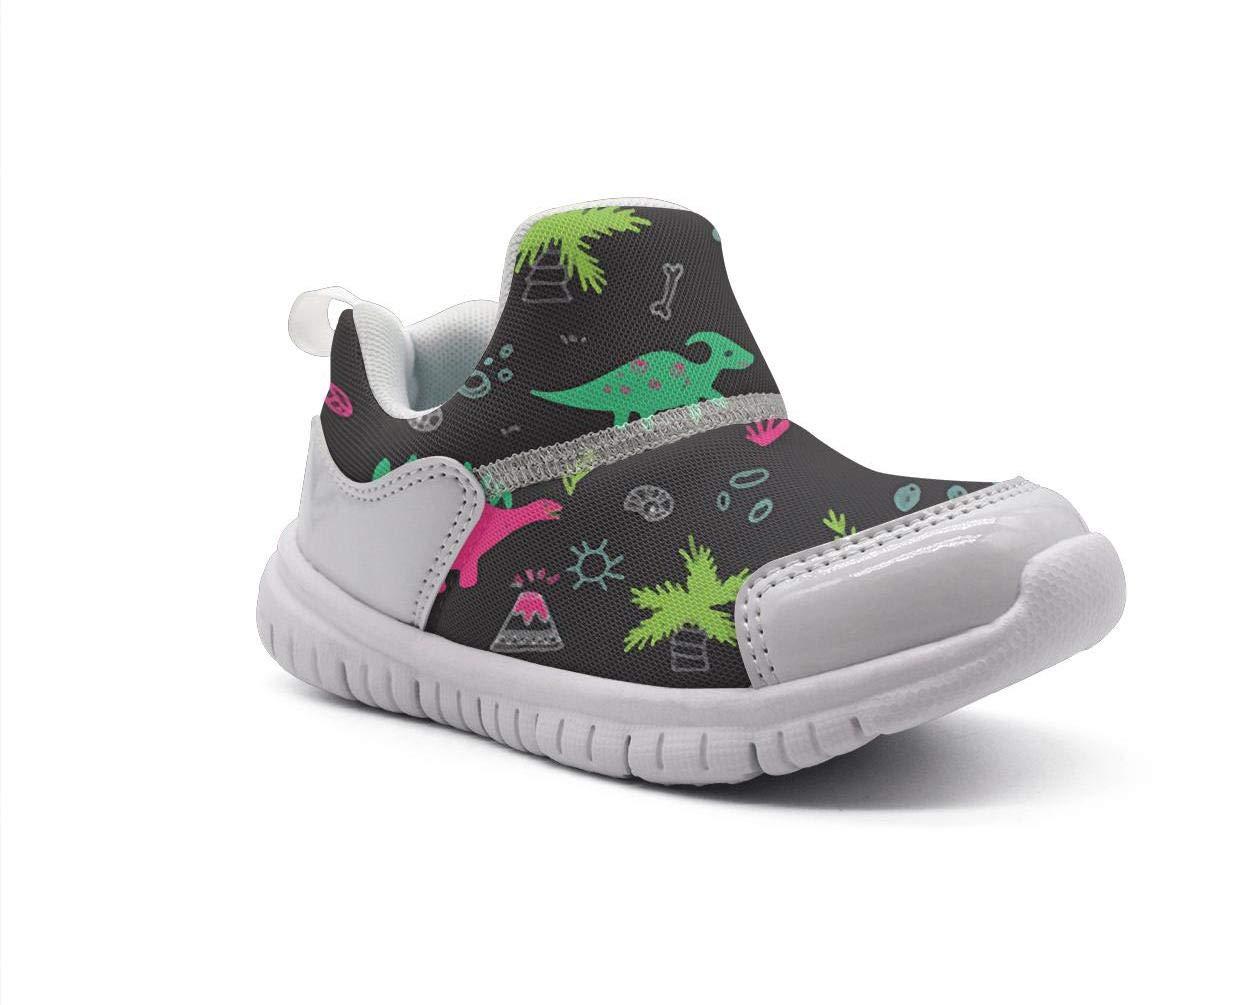 ONEYUAN Children Black Cute Untamed Fingerlings Dinosaurs Kid Casual Lightweight Sport Shoes Sneakers Walking Athletic Shoes